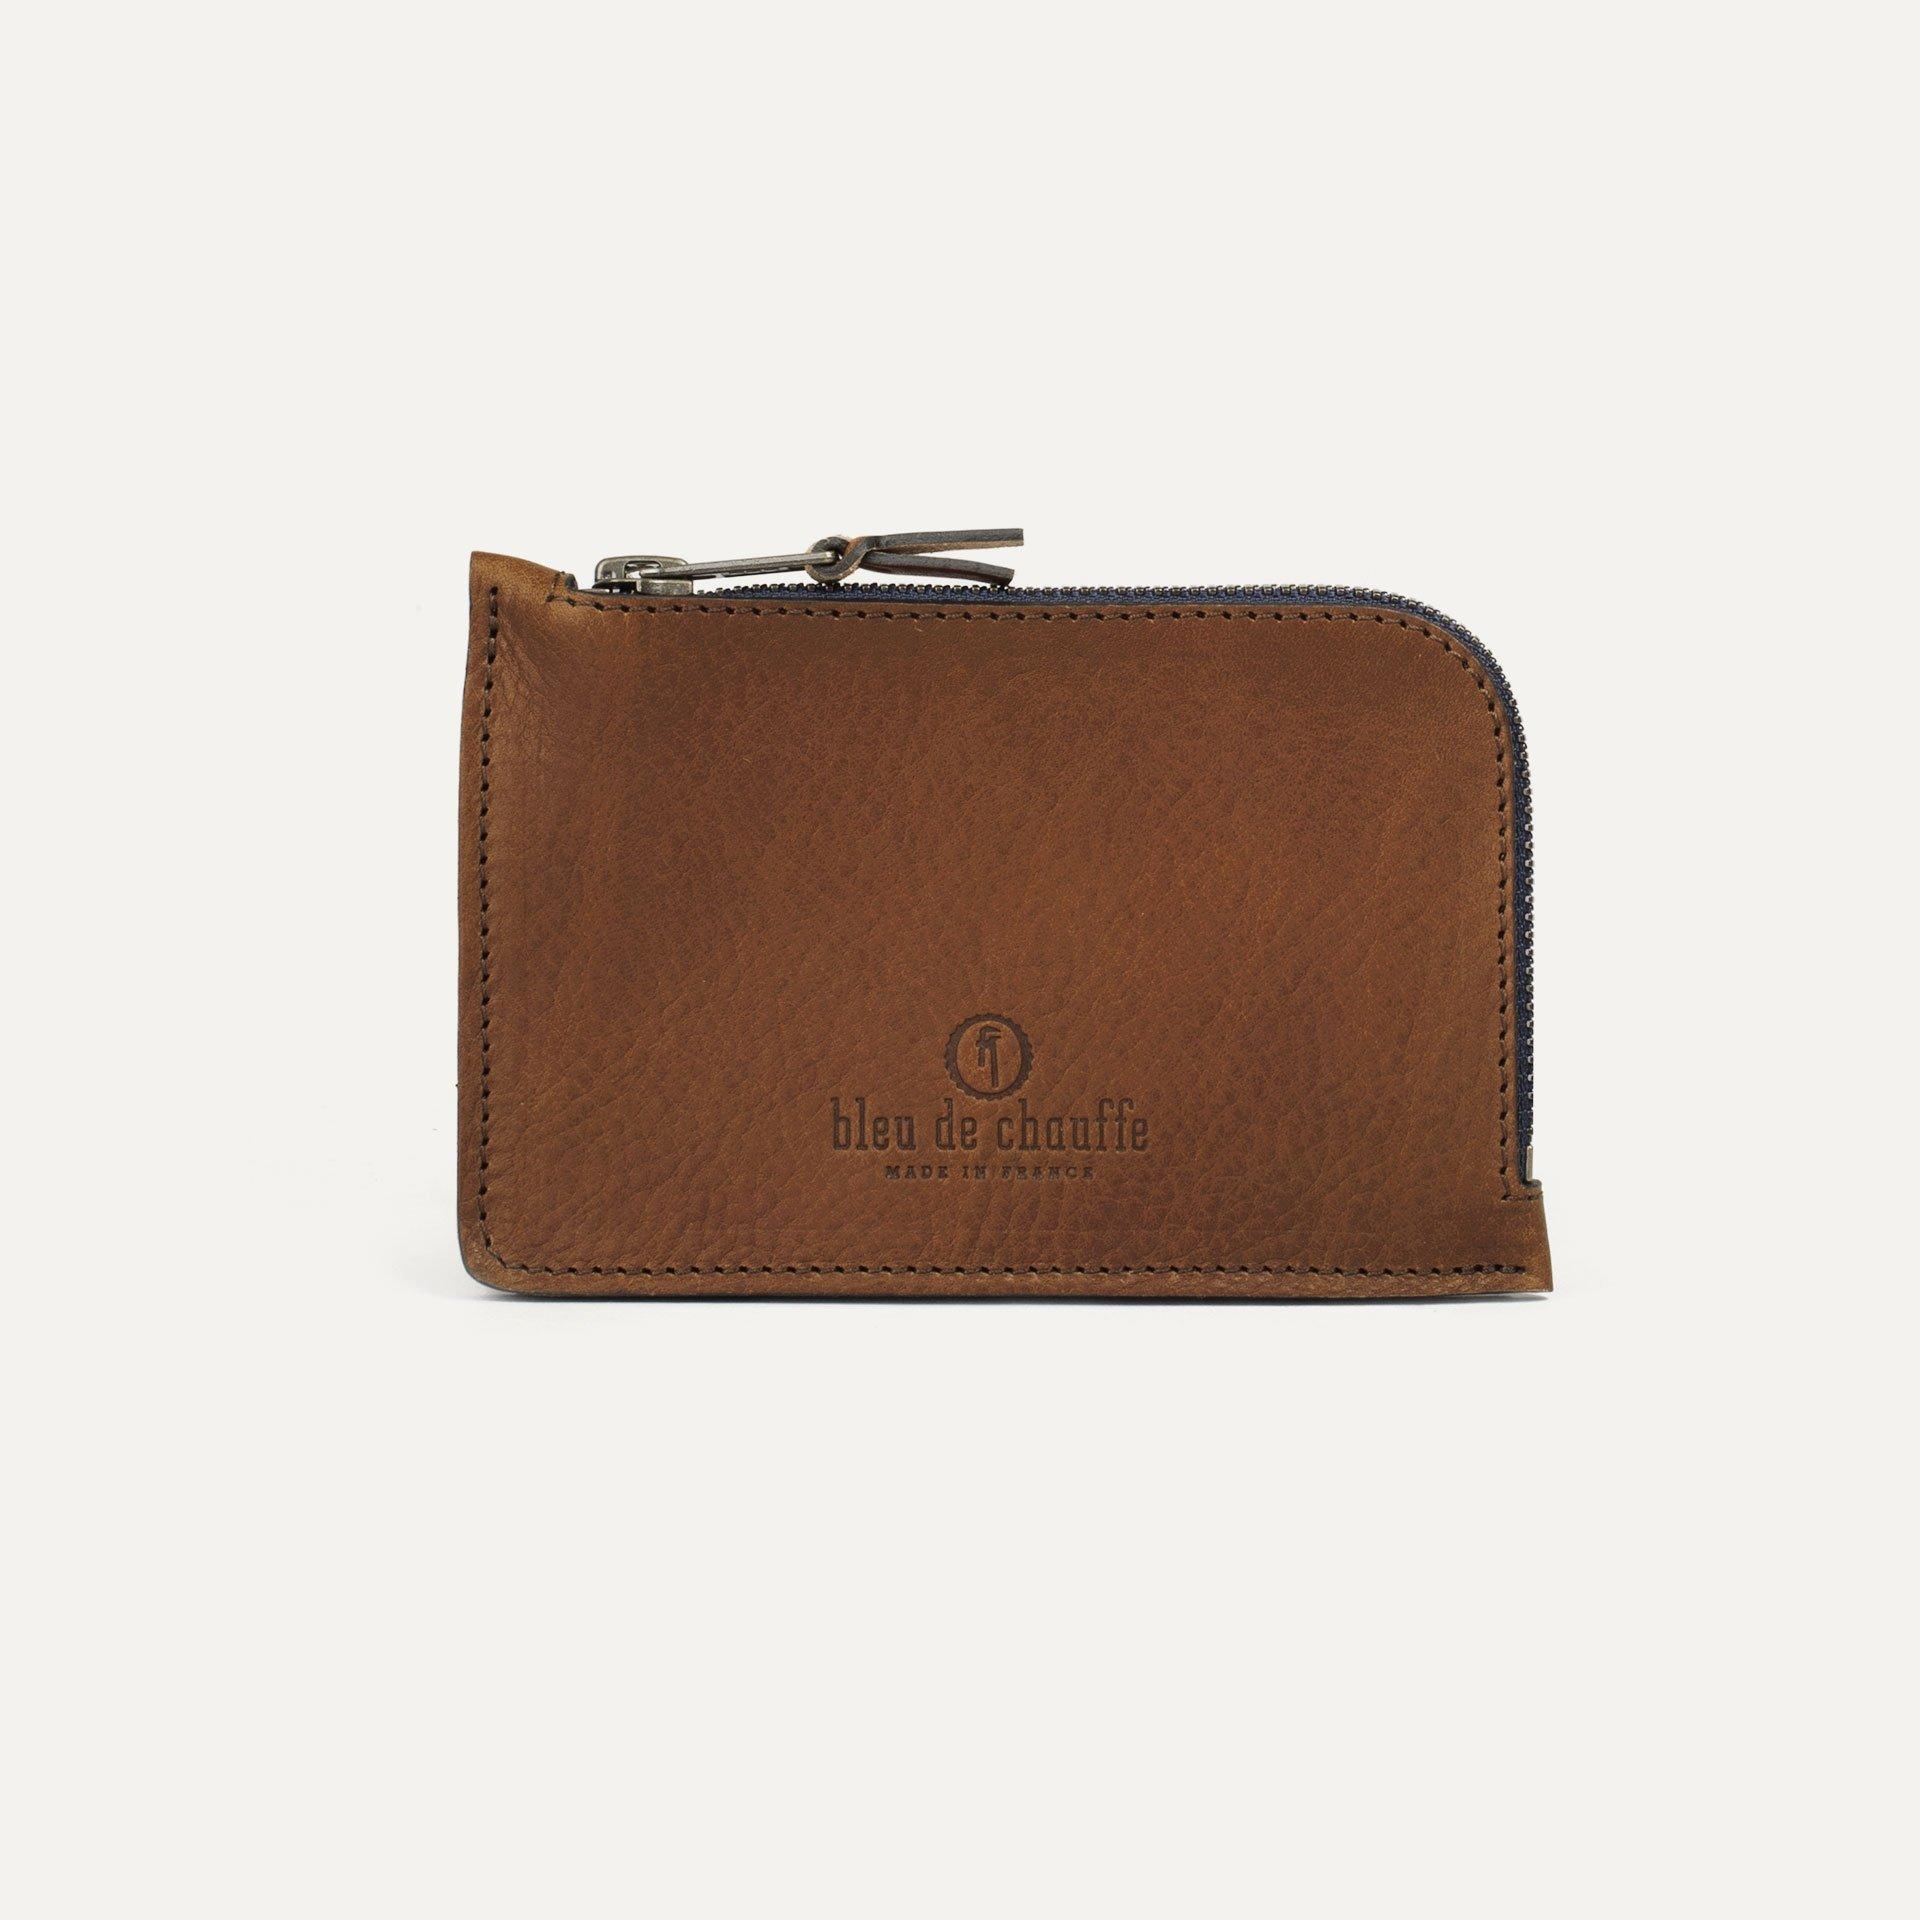 Pognon zippered purse  / L - Cuba Libre (image n°1)